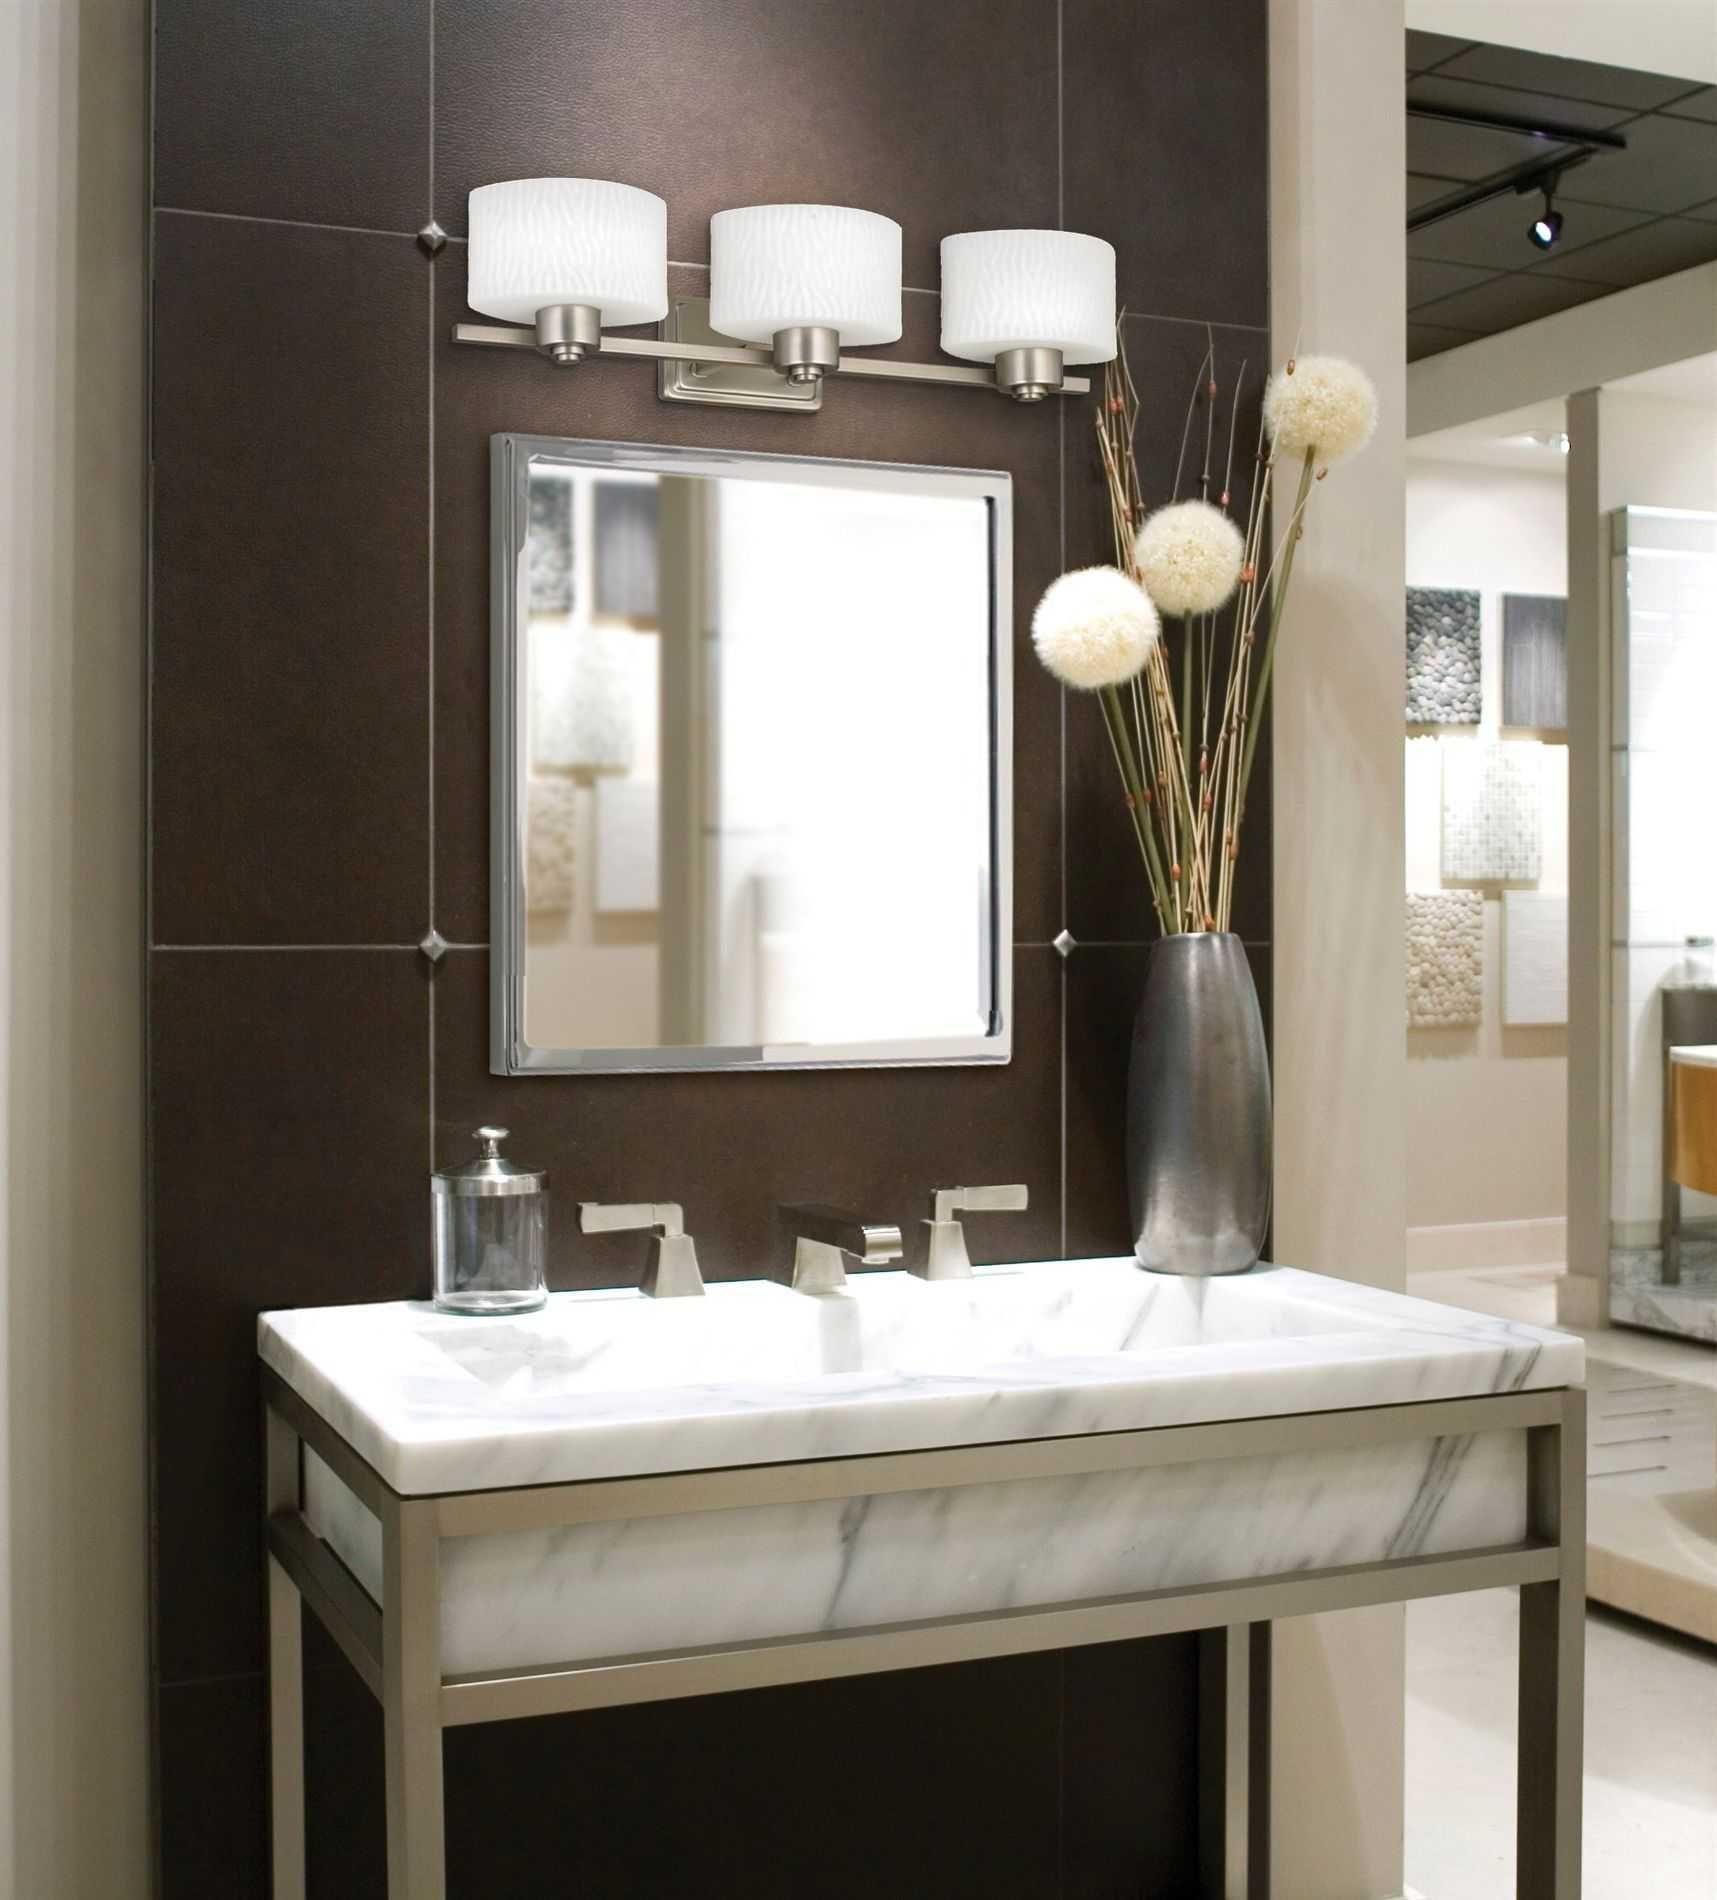 24 Luxury Vanity Mirror With Lights Ideas Industrial Bathroom